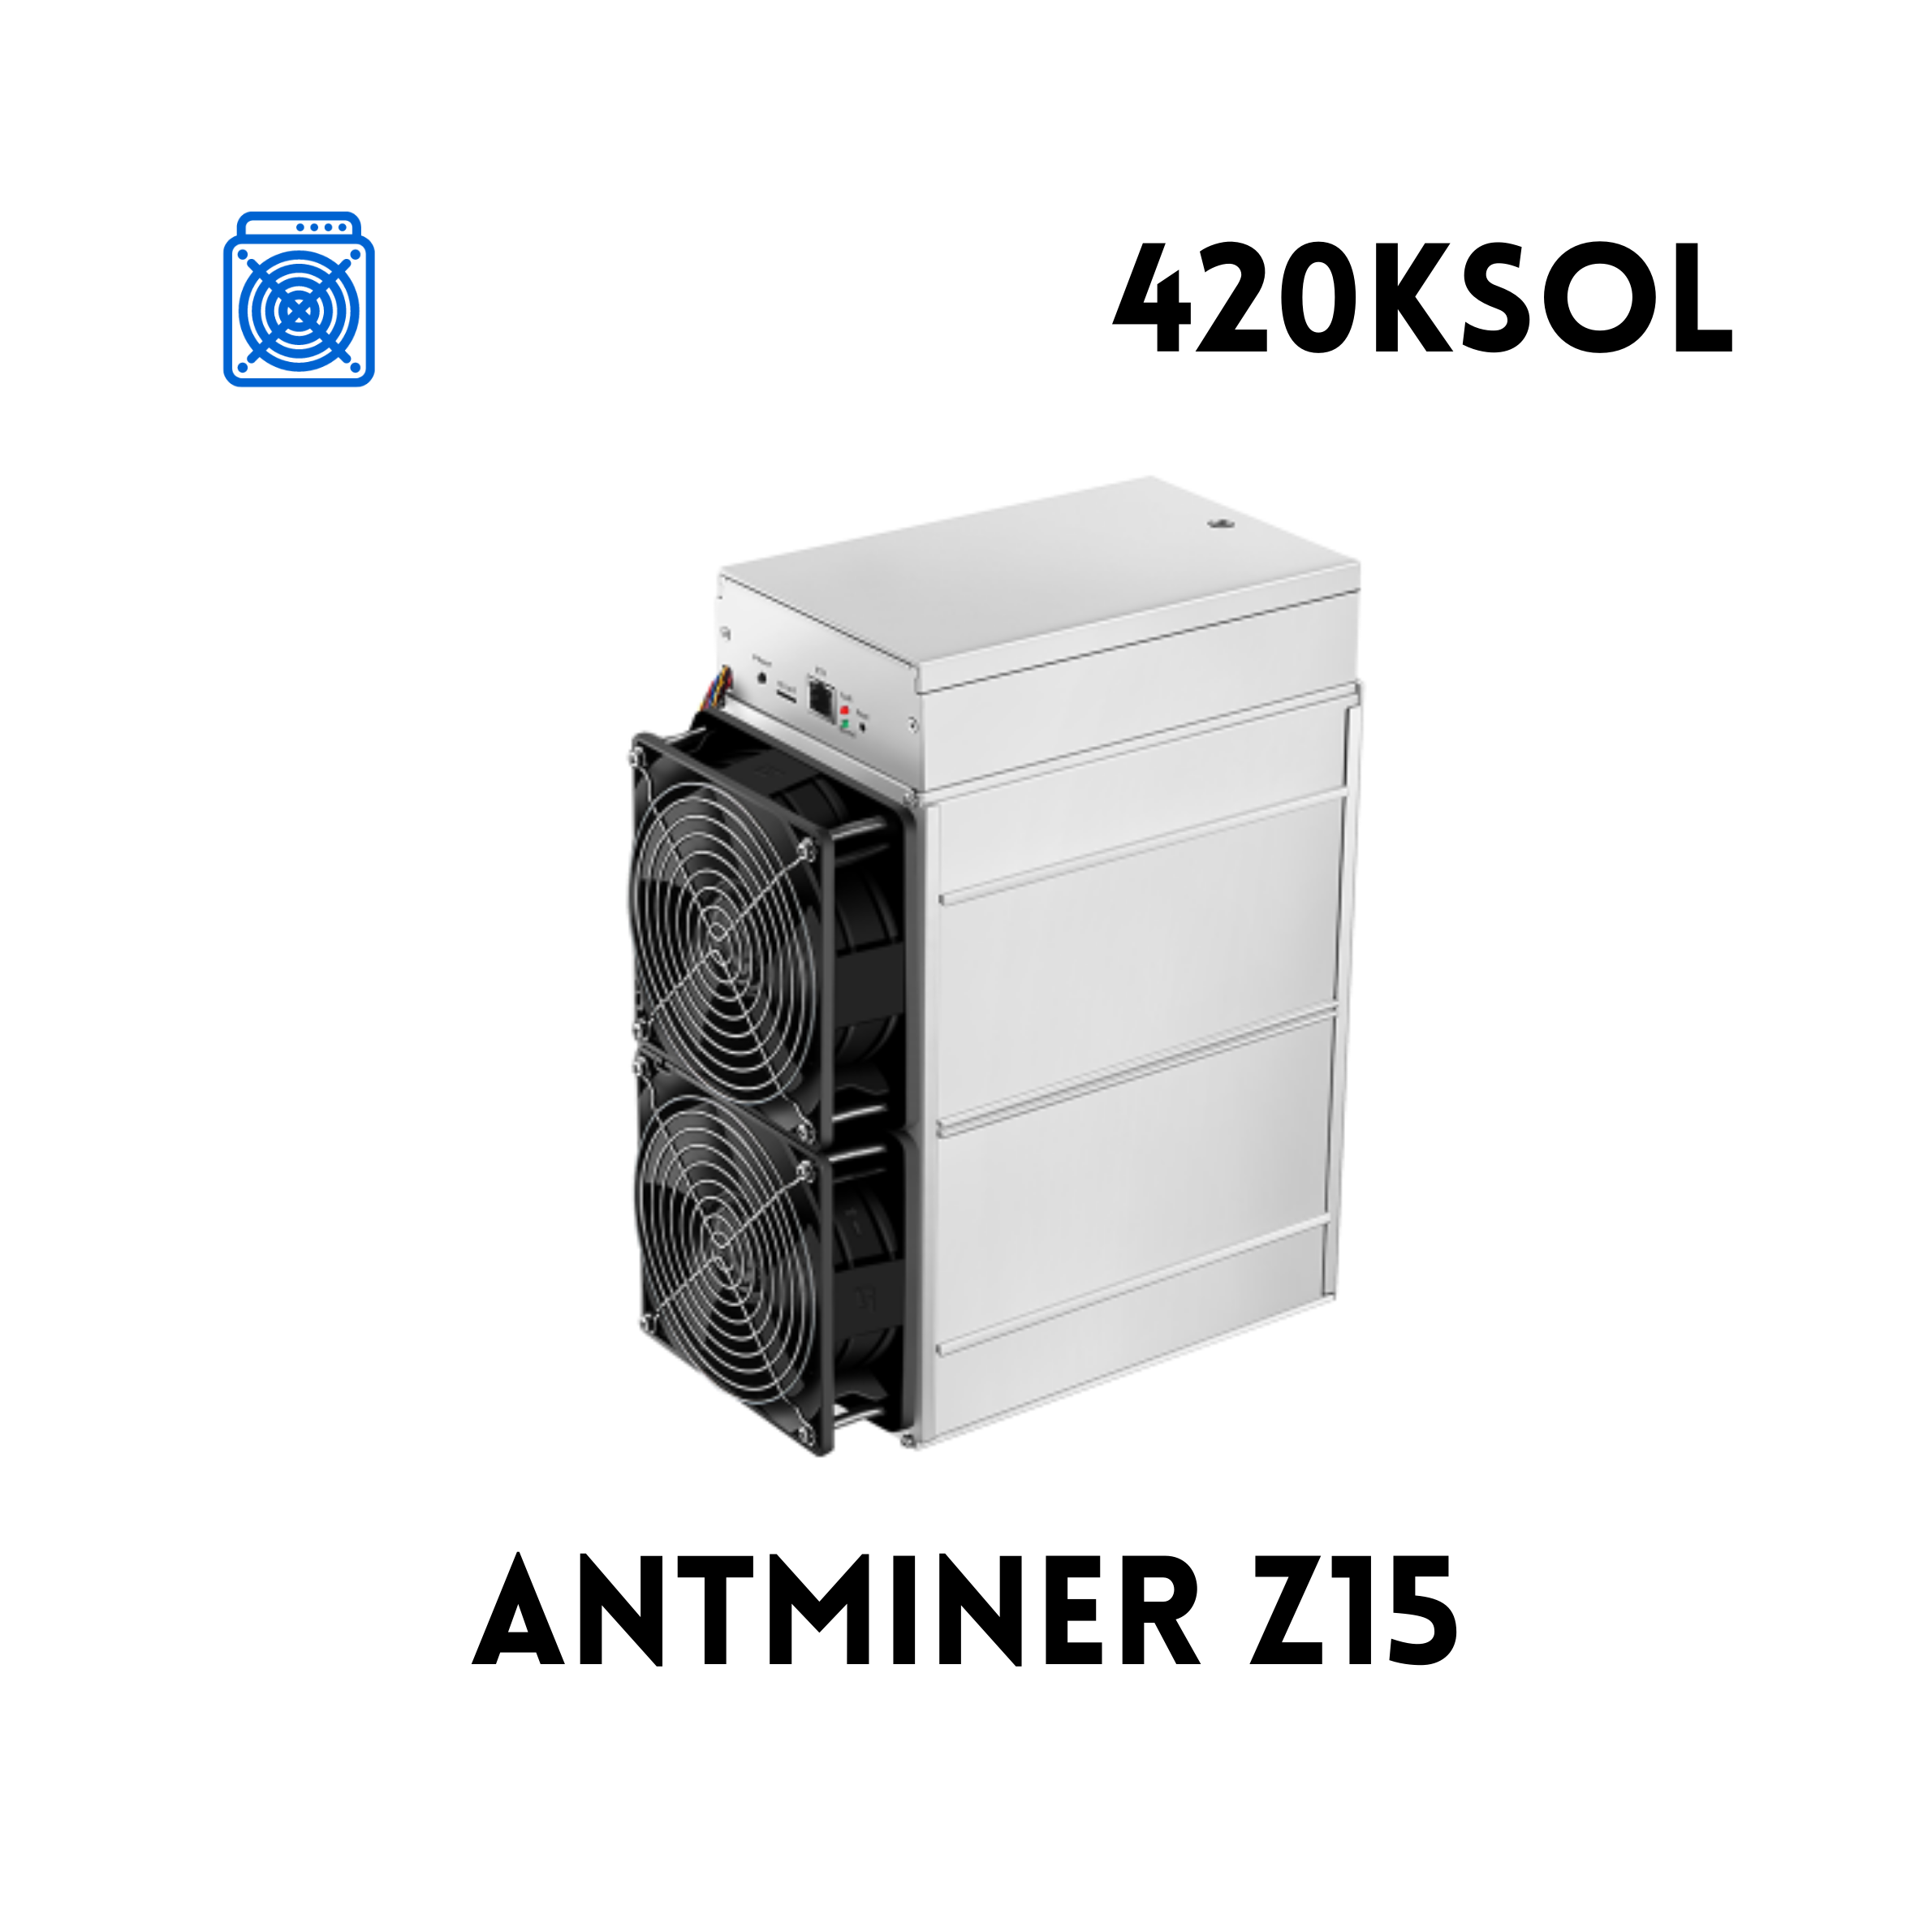 BITMAIN ANTMINER Z15 (420KSOL)   Asic Marketplace